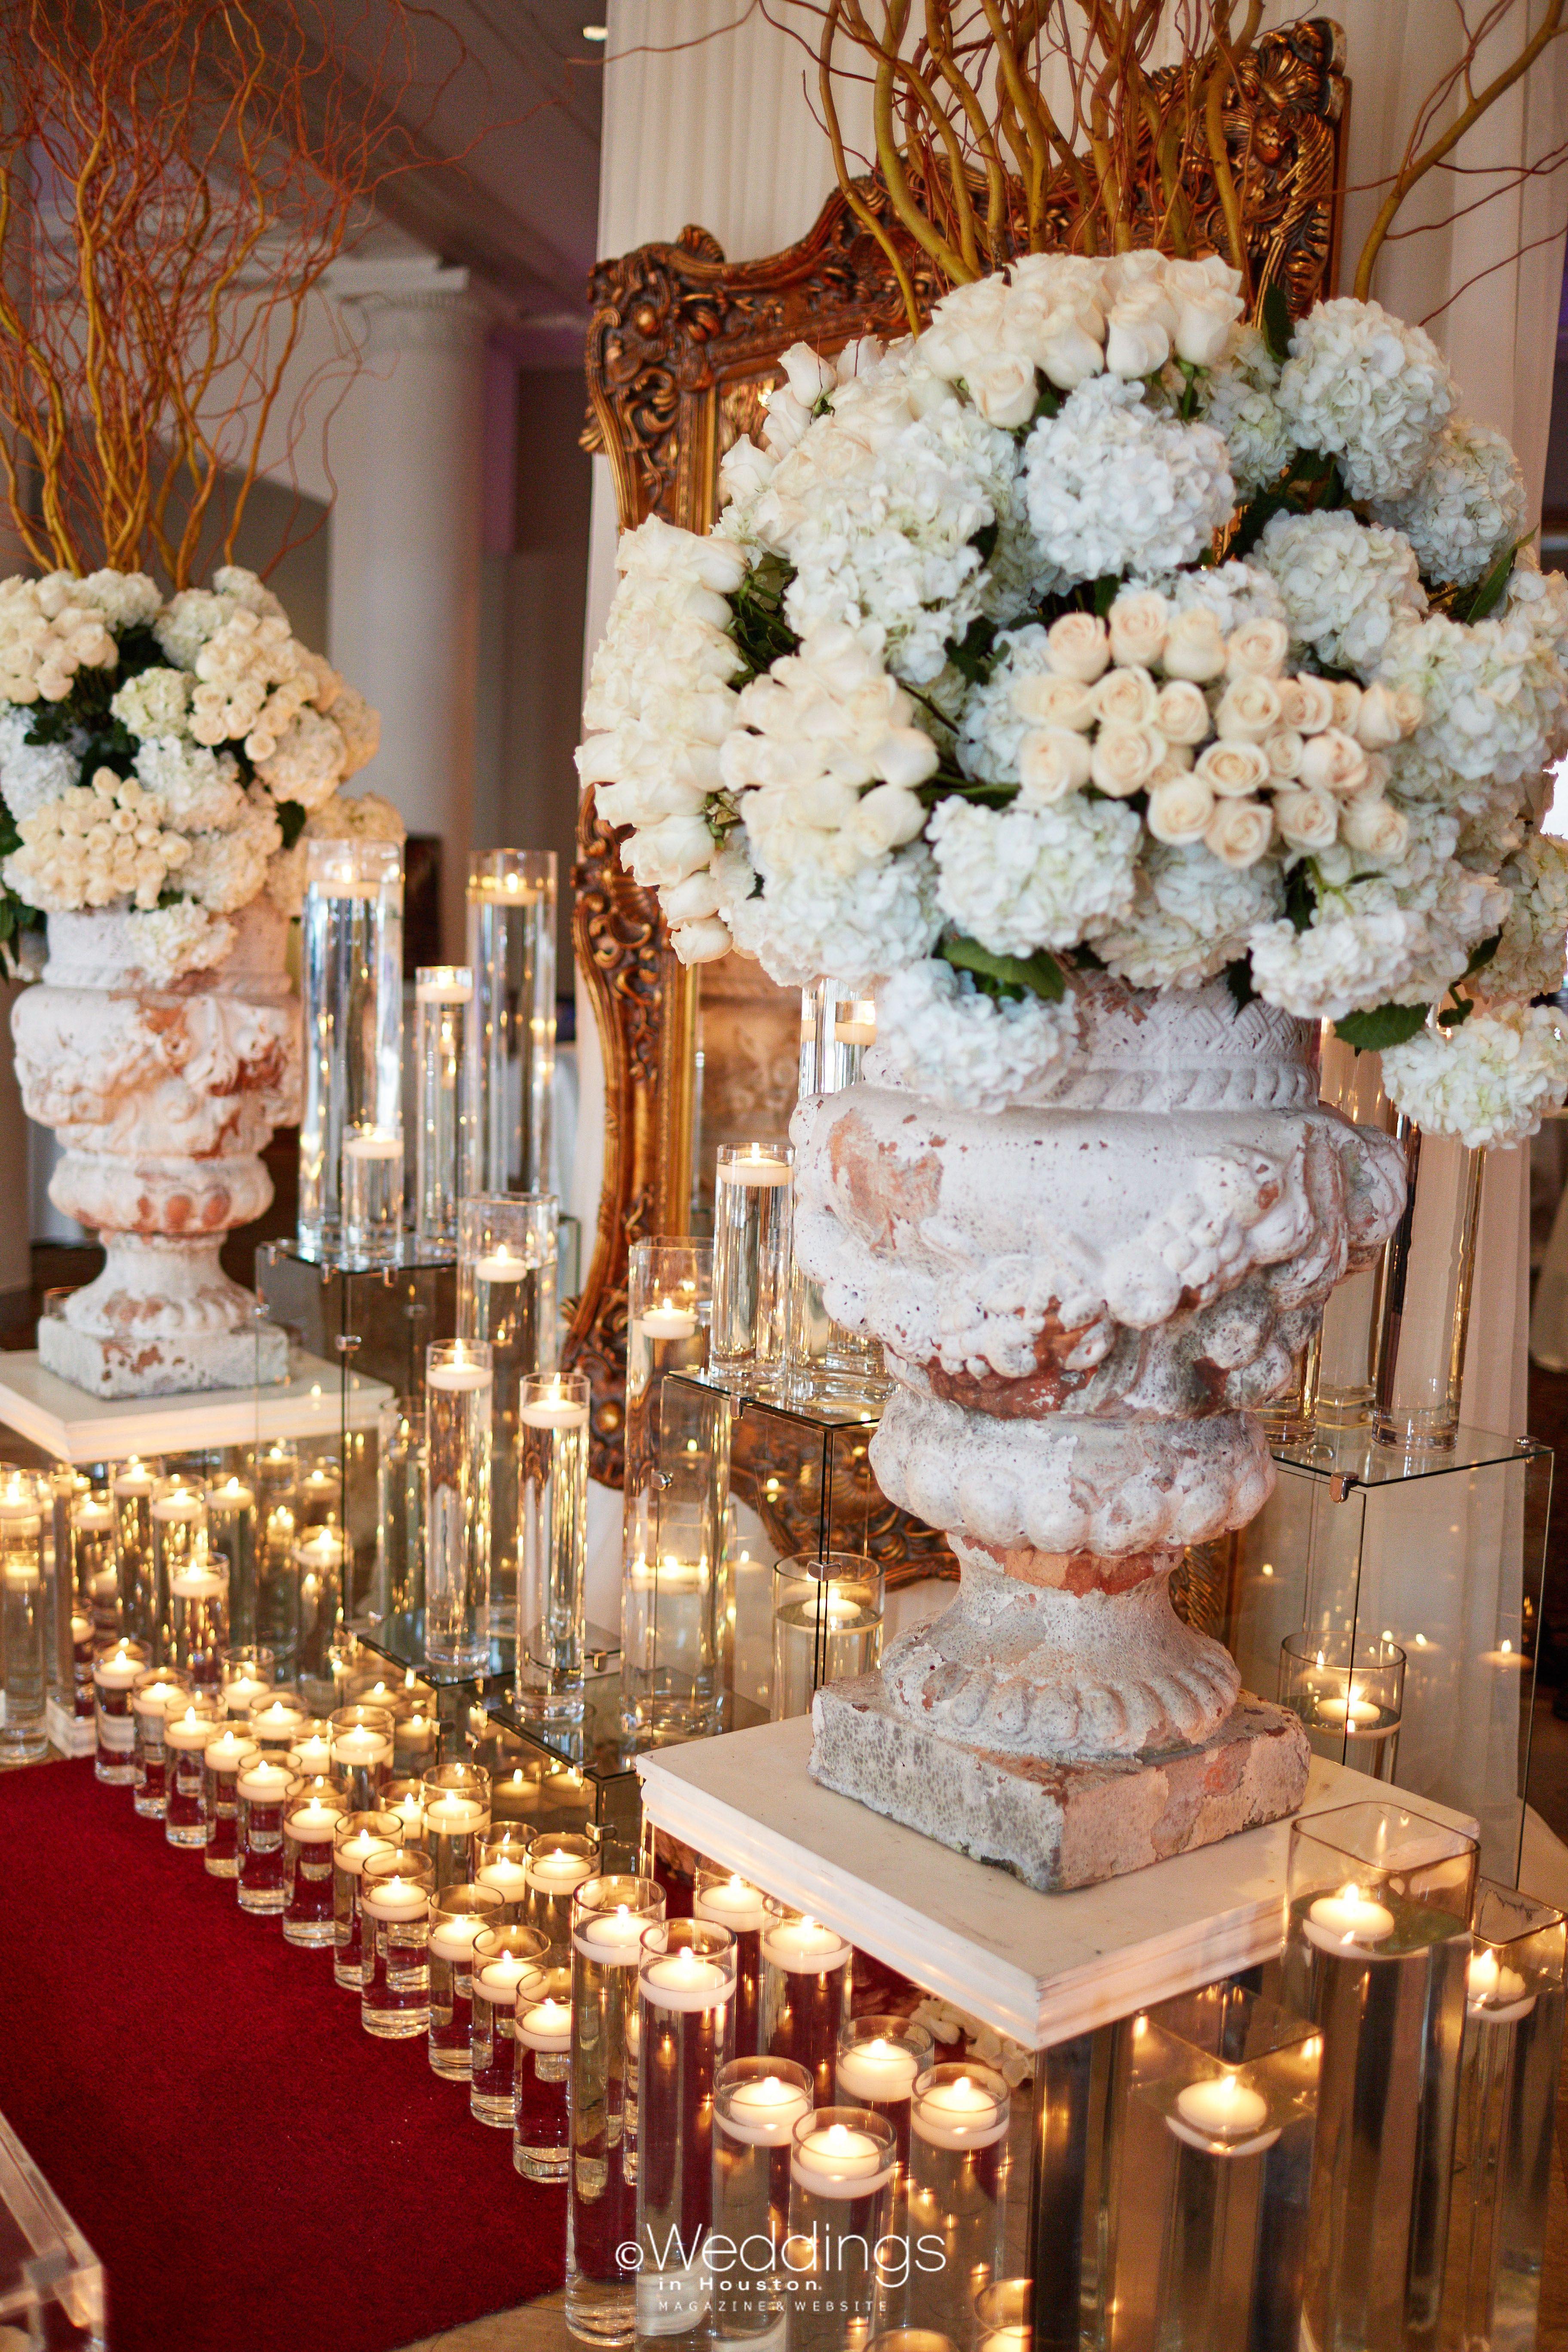 Extravagant White & Gold Wedding Ceremony Decor A.J.'s